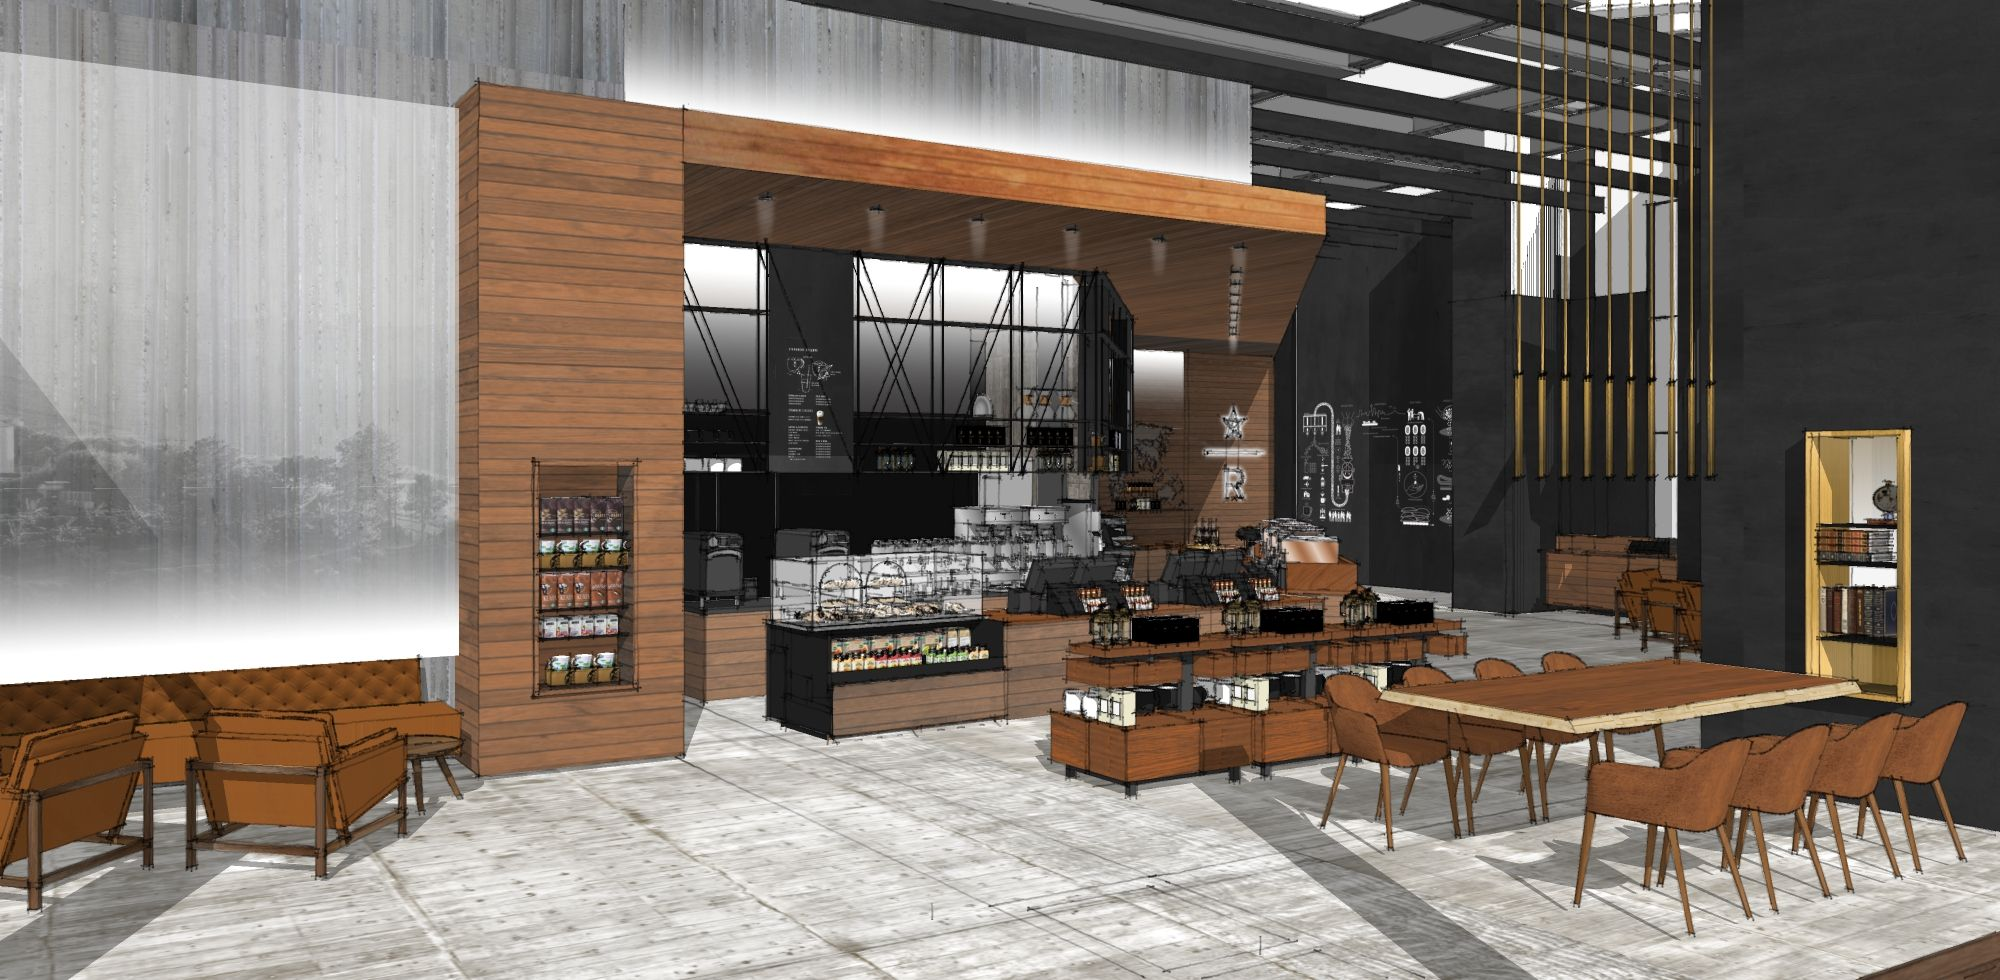 Sketchup rendering of the starbucks reserve bar at